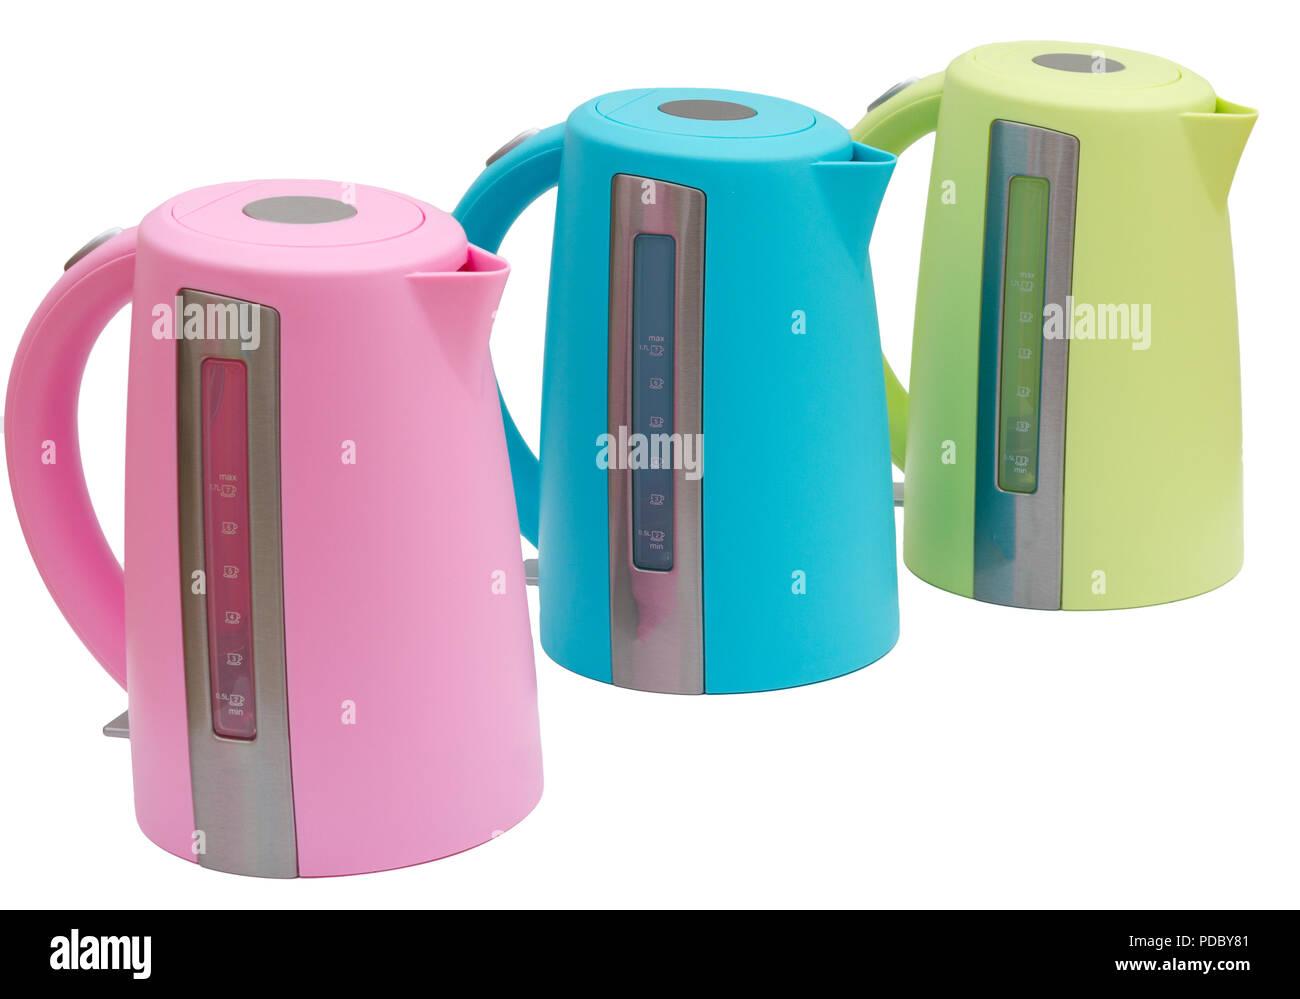 Calentadores de agua eléctricos de colores brillantes teteras de té aislado sobre fondo blanco. Imagen De Stock